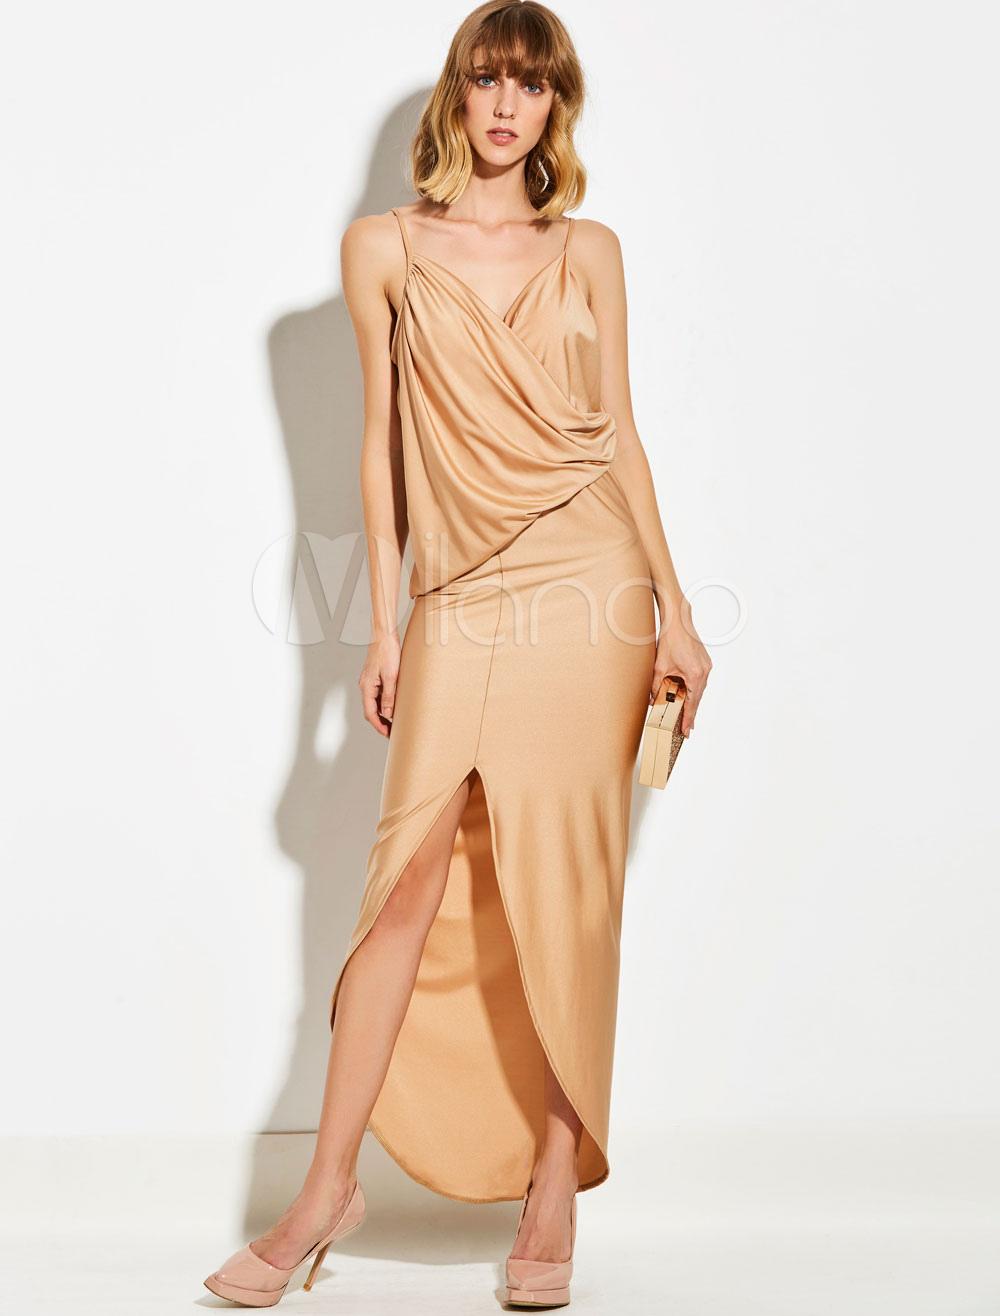 Women Maxi Dress Silk Like Strappy Slit Ruched Blonde Sleeveless Long Evening Dress (Women\\'s Clothing Maxi Dresses) photo